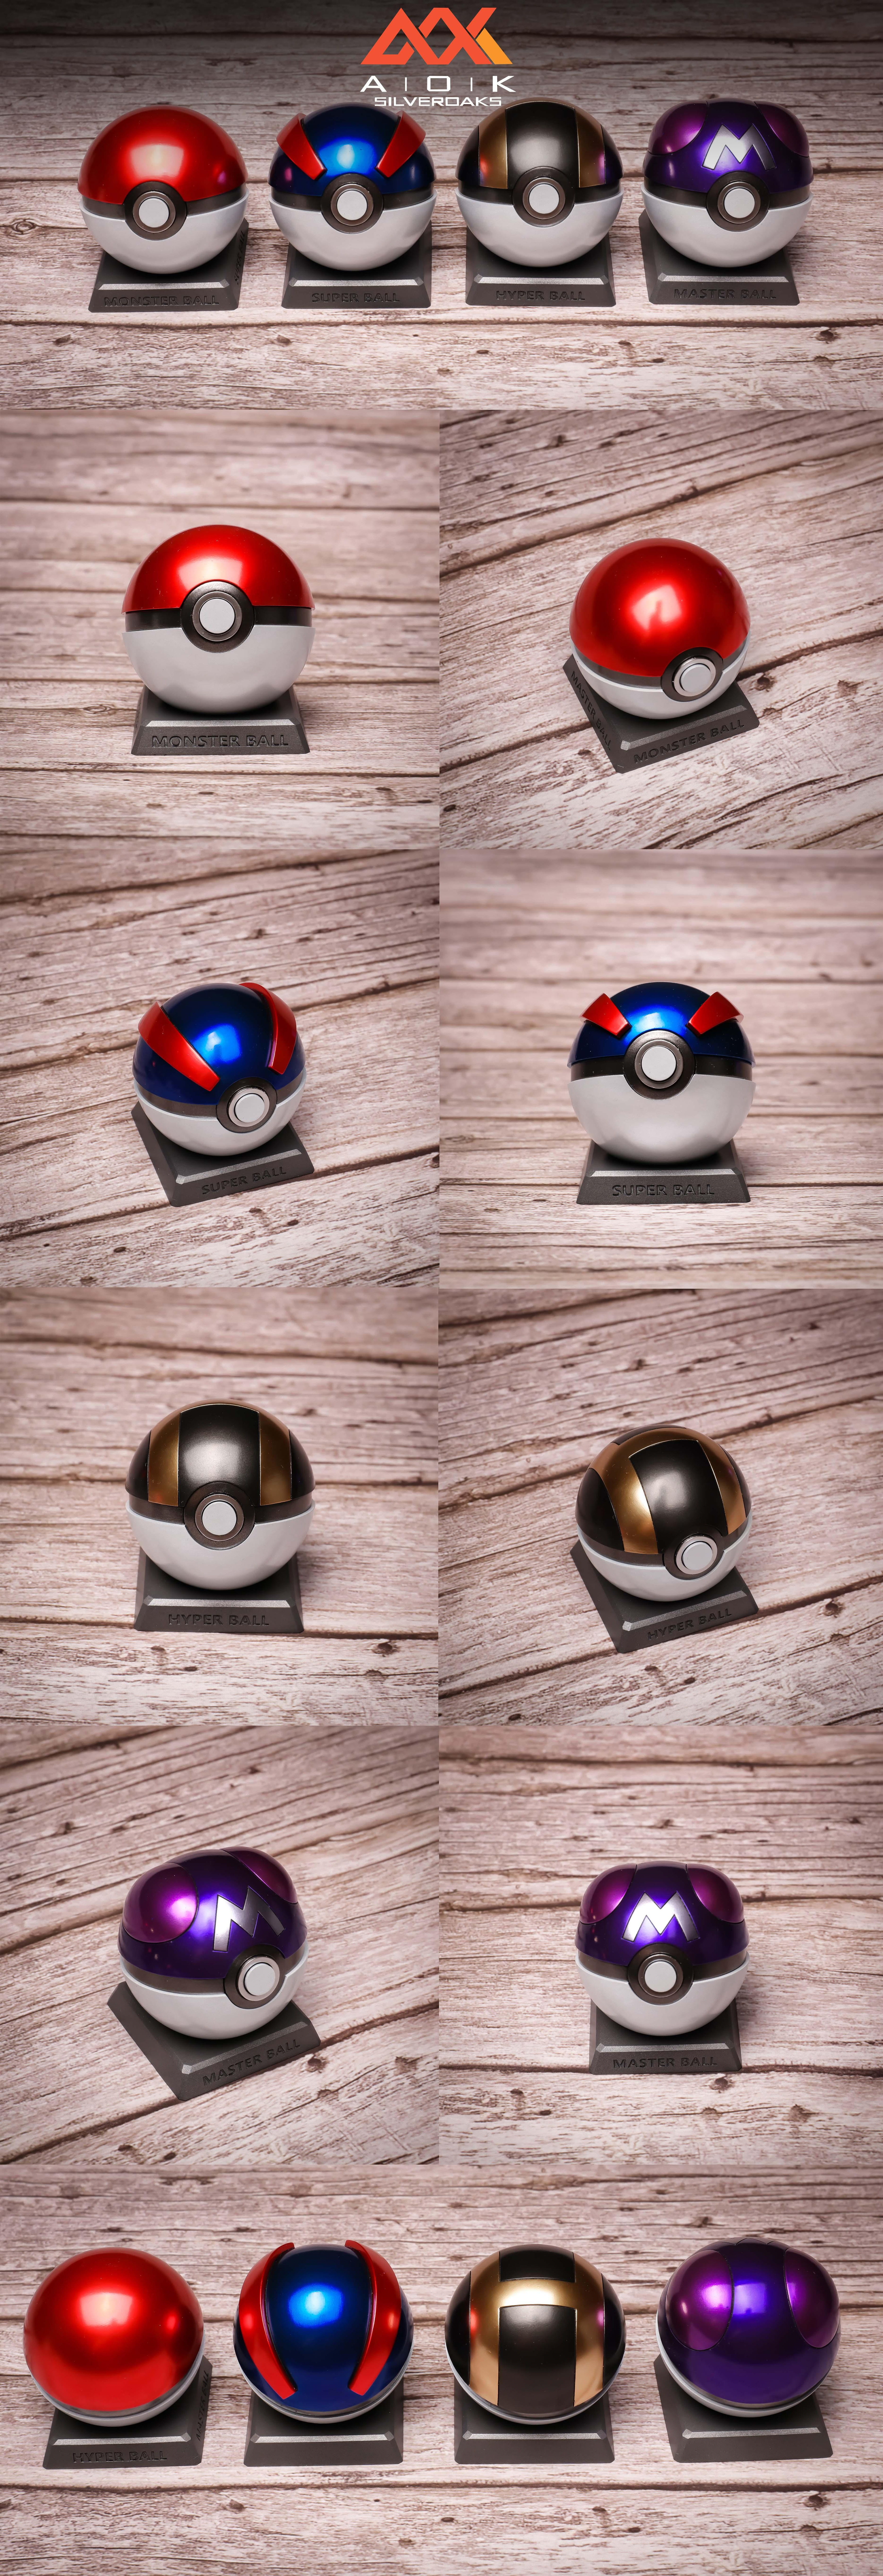 G509_pokemon_ball_019.jpg